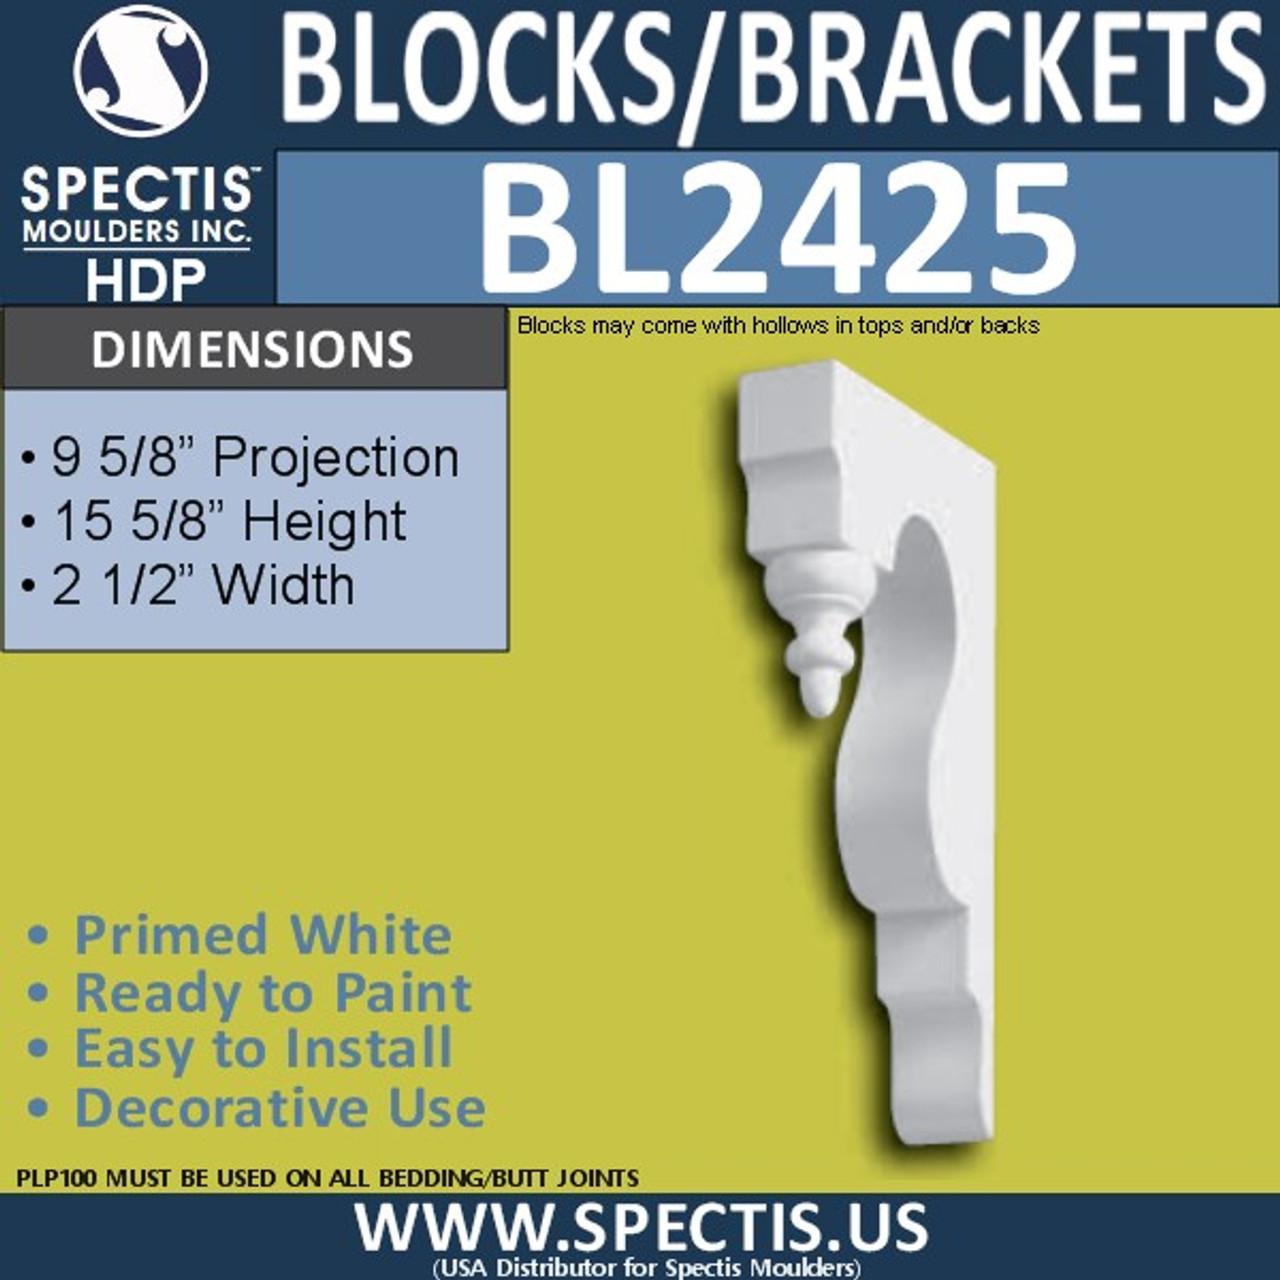 "BL2425 Eave Block or Bracket 2.5""W x 15.5""H x 9.5"" P"